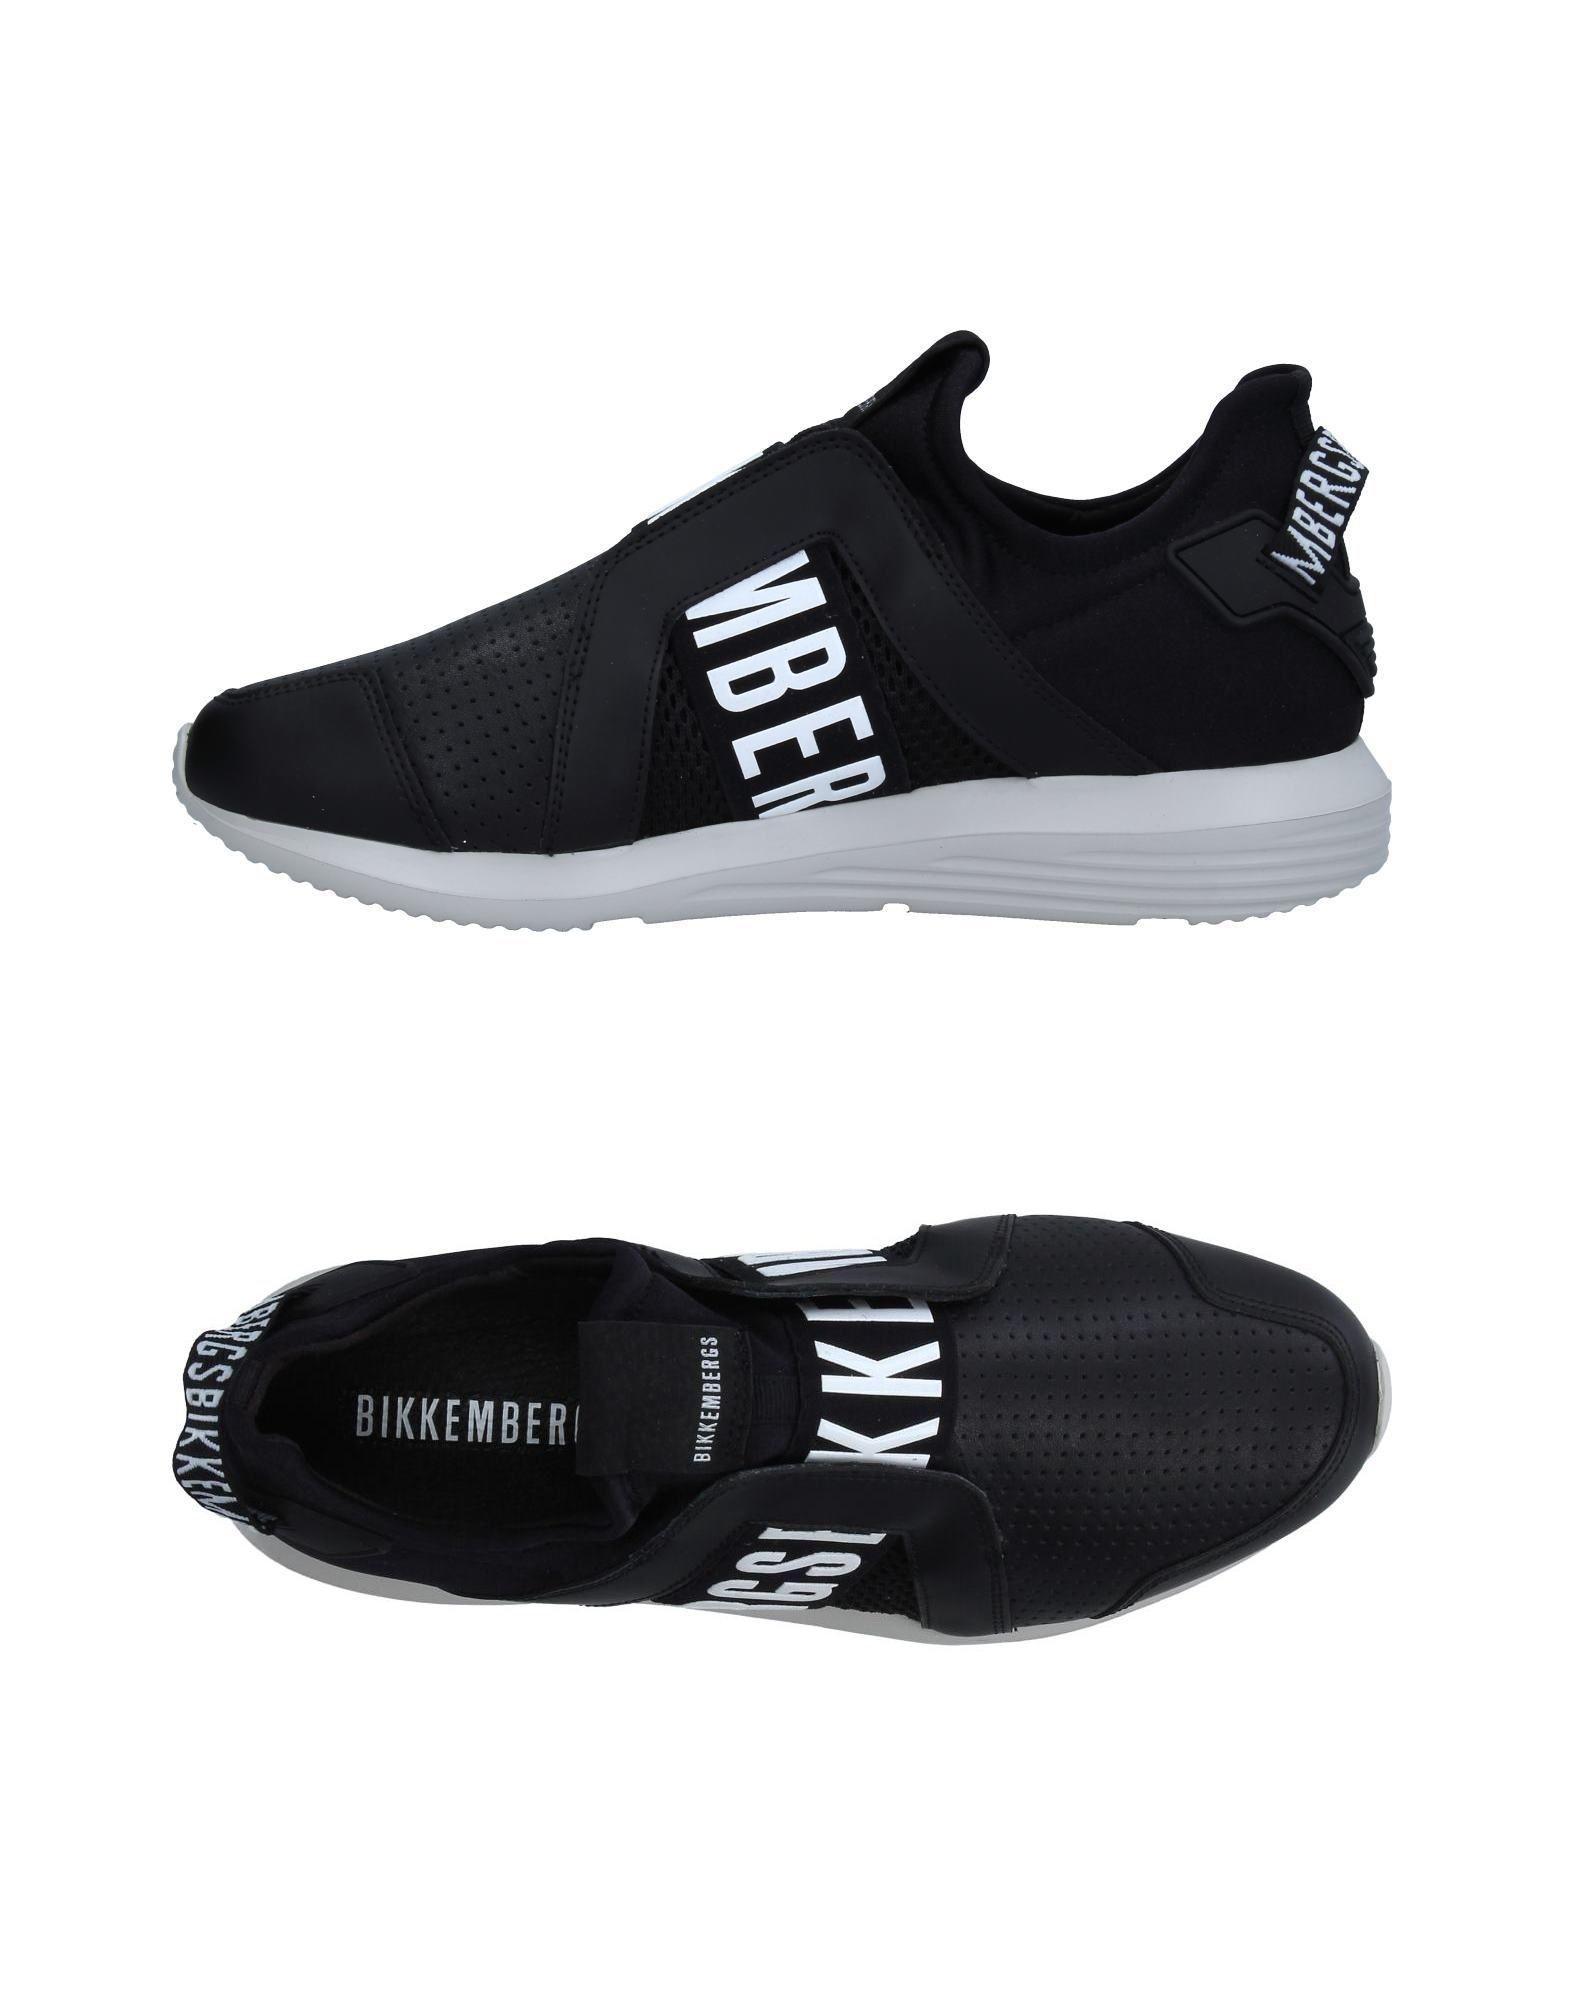 Bikkembergs Sneakers Herren  11332403WR Gute Qualität beliebte Schuhe